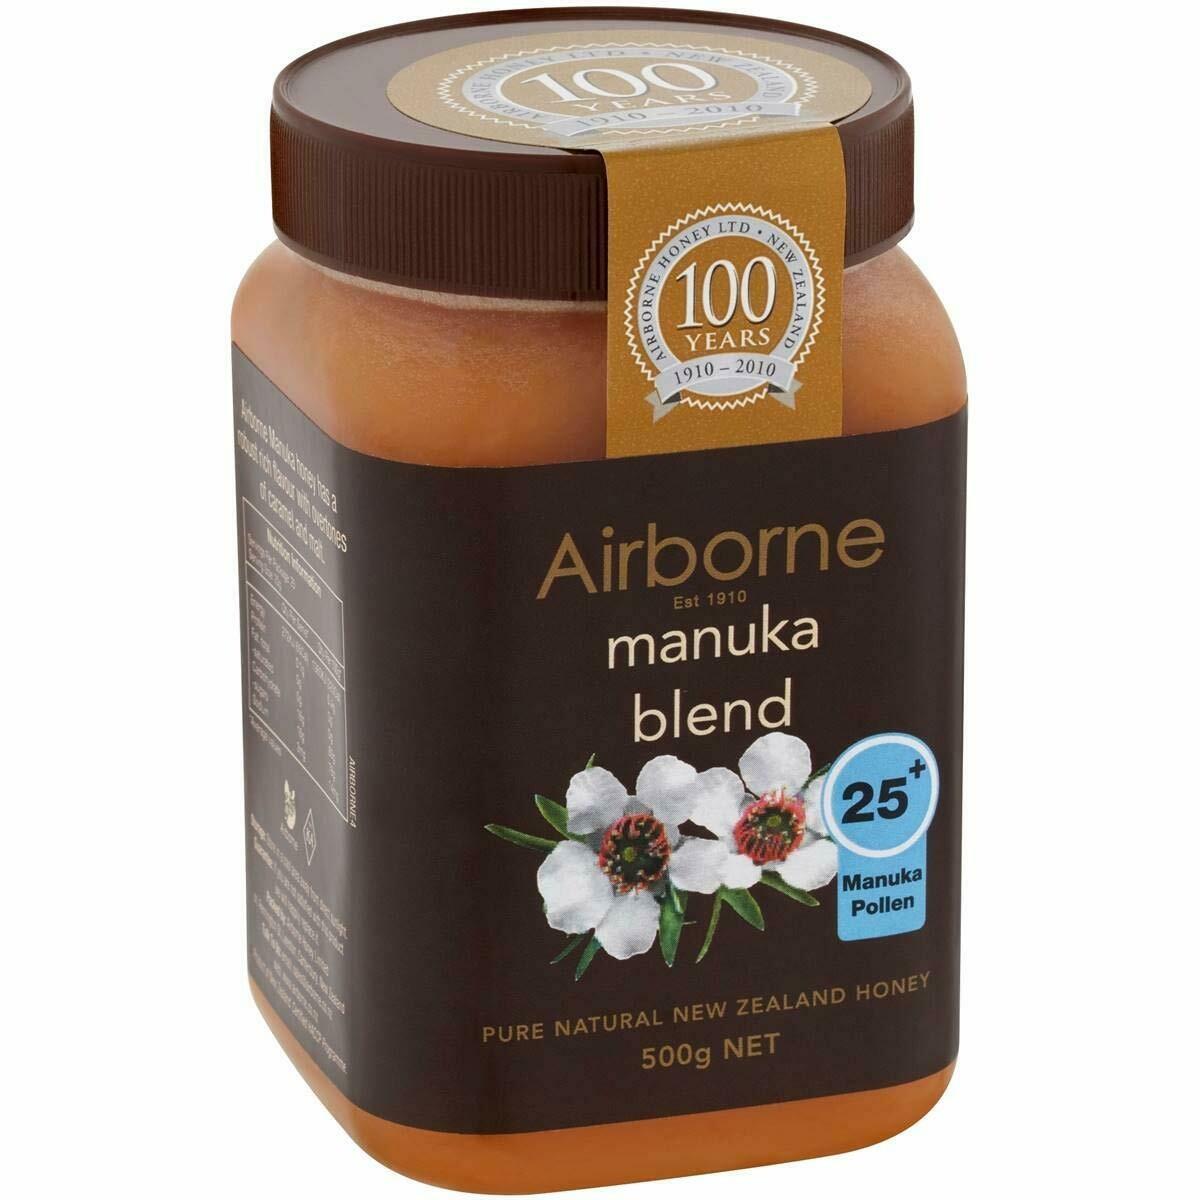 Airborne Manuka Blend Honey 25 plus 500g